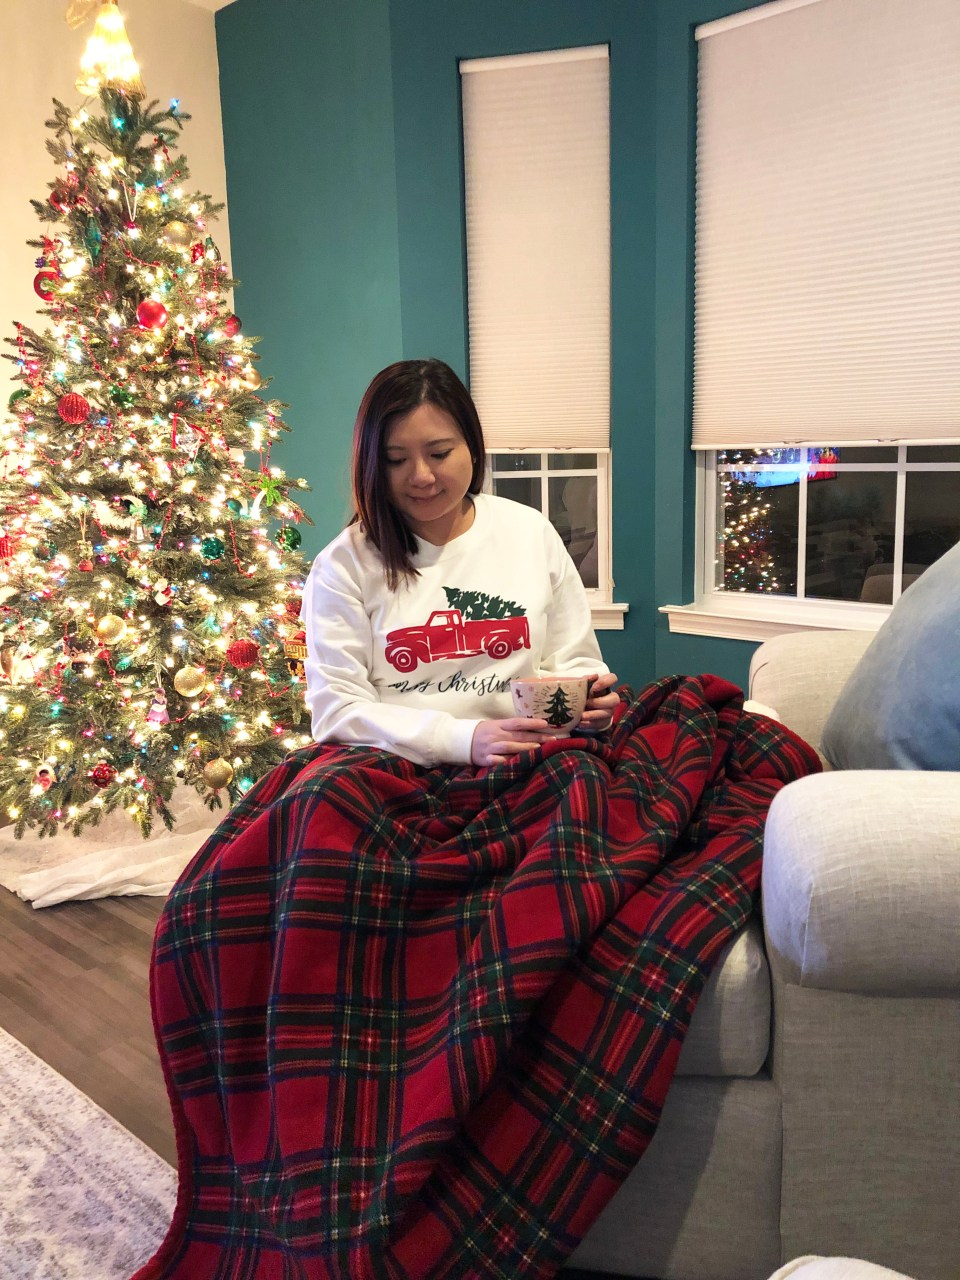 Christmas Tree Truck Sweatshirt + Plaid Sherpa Blanket 4